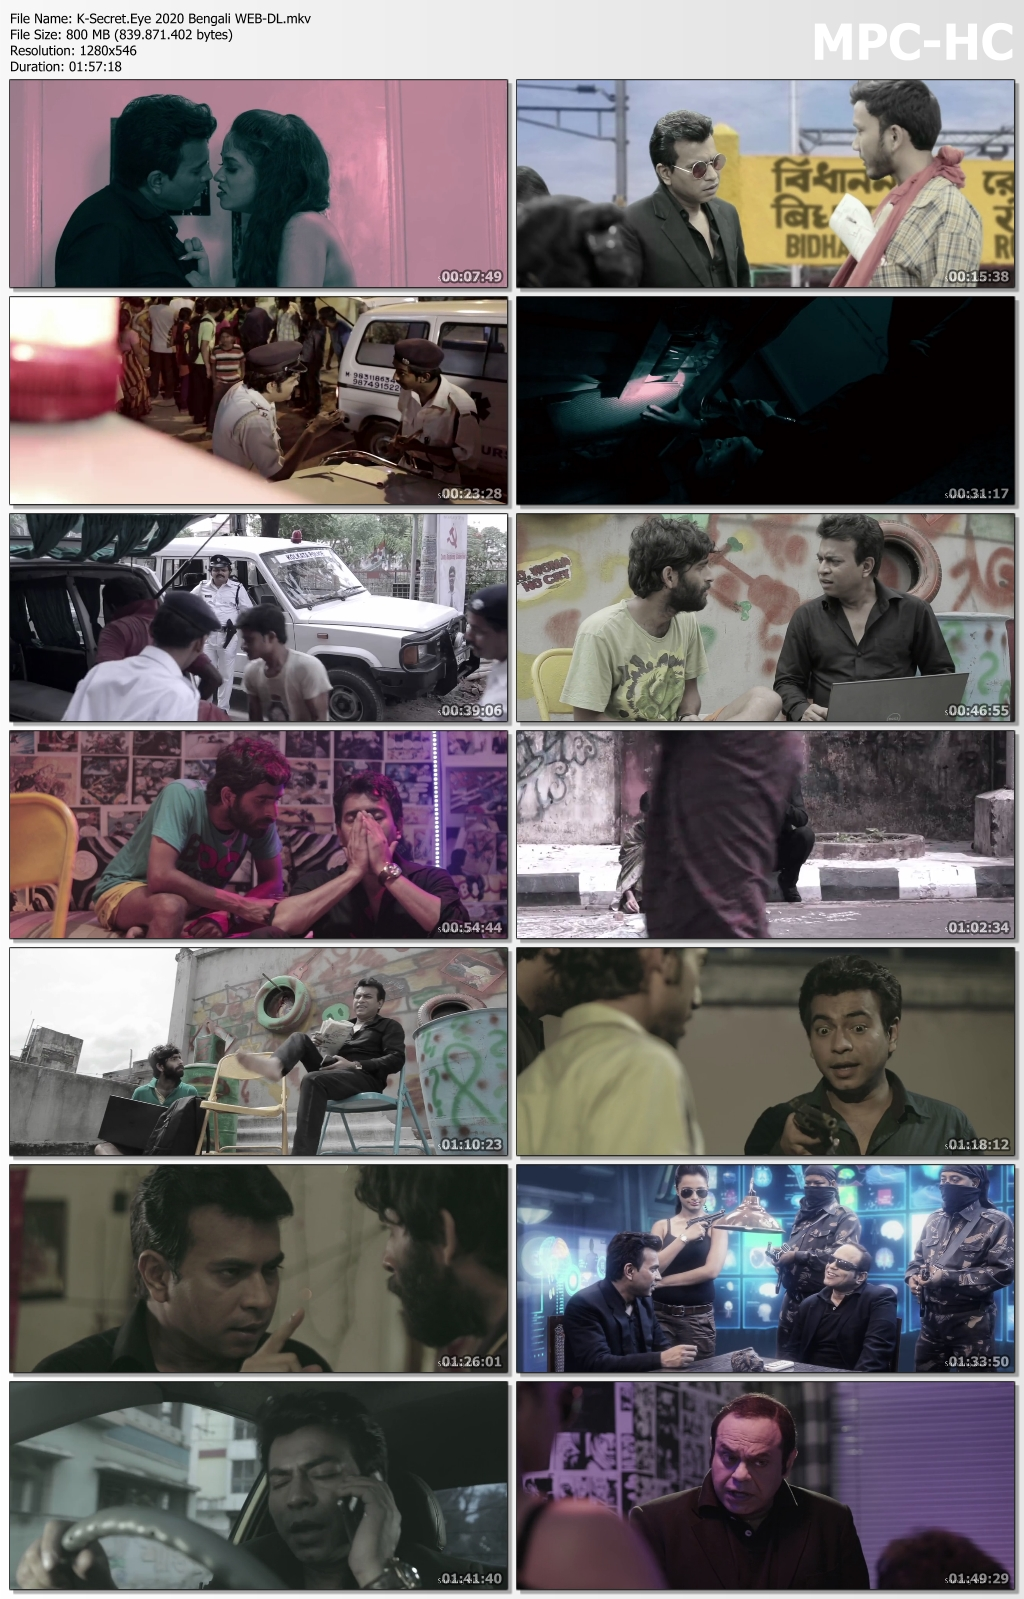 K-Secret-Eye-2020-Bengali-WEB-DL-mkv-thumbs